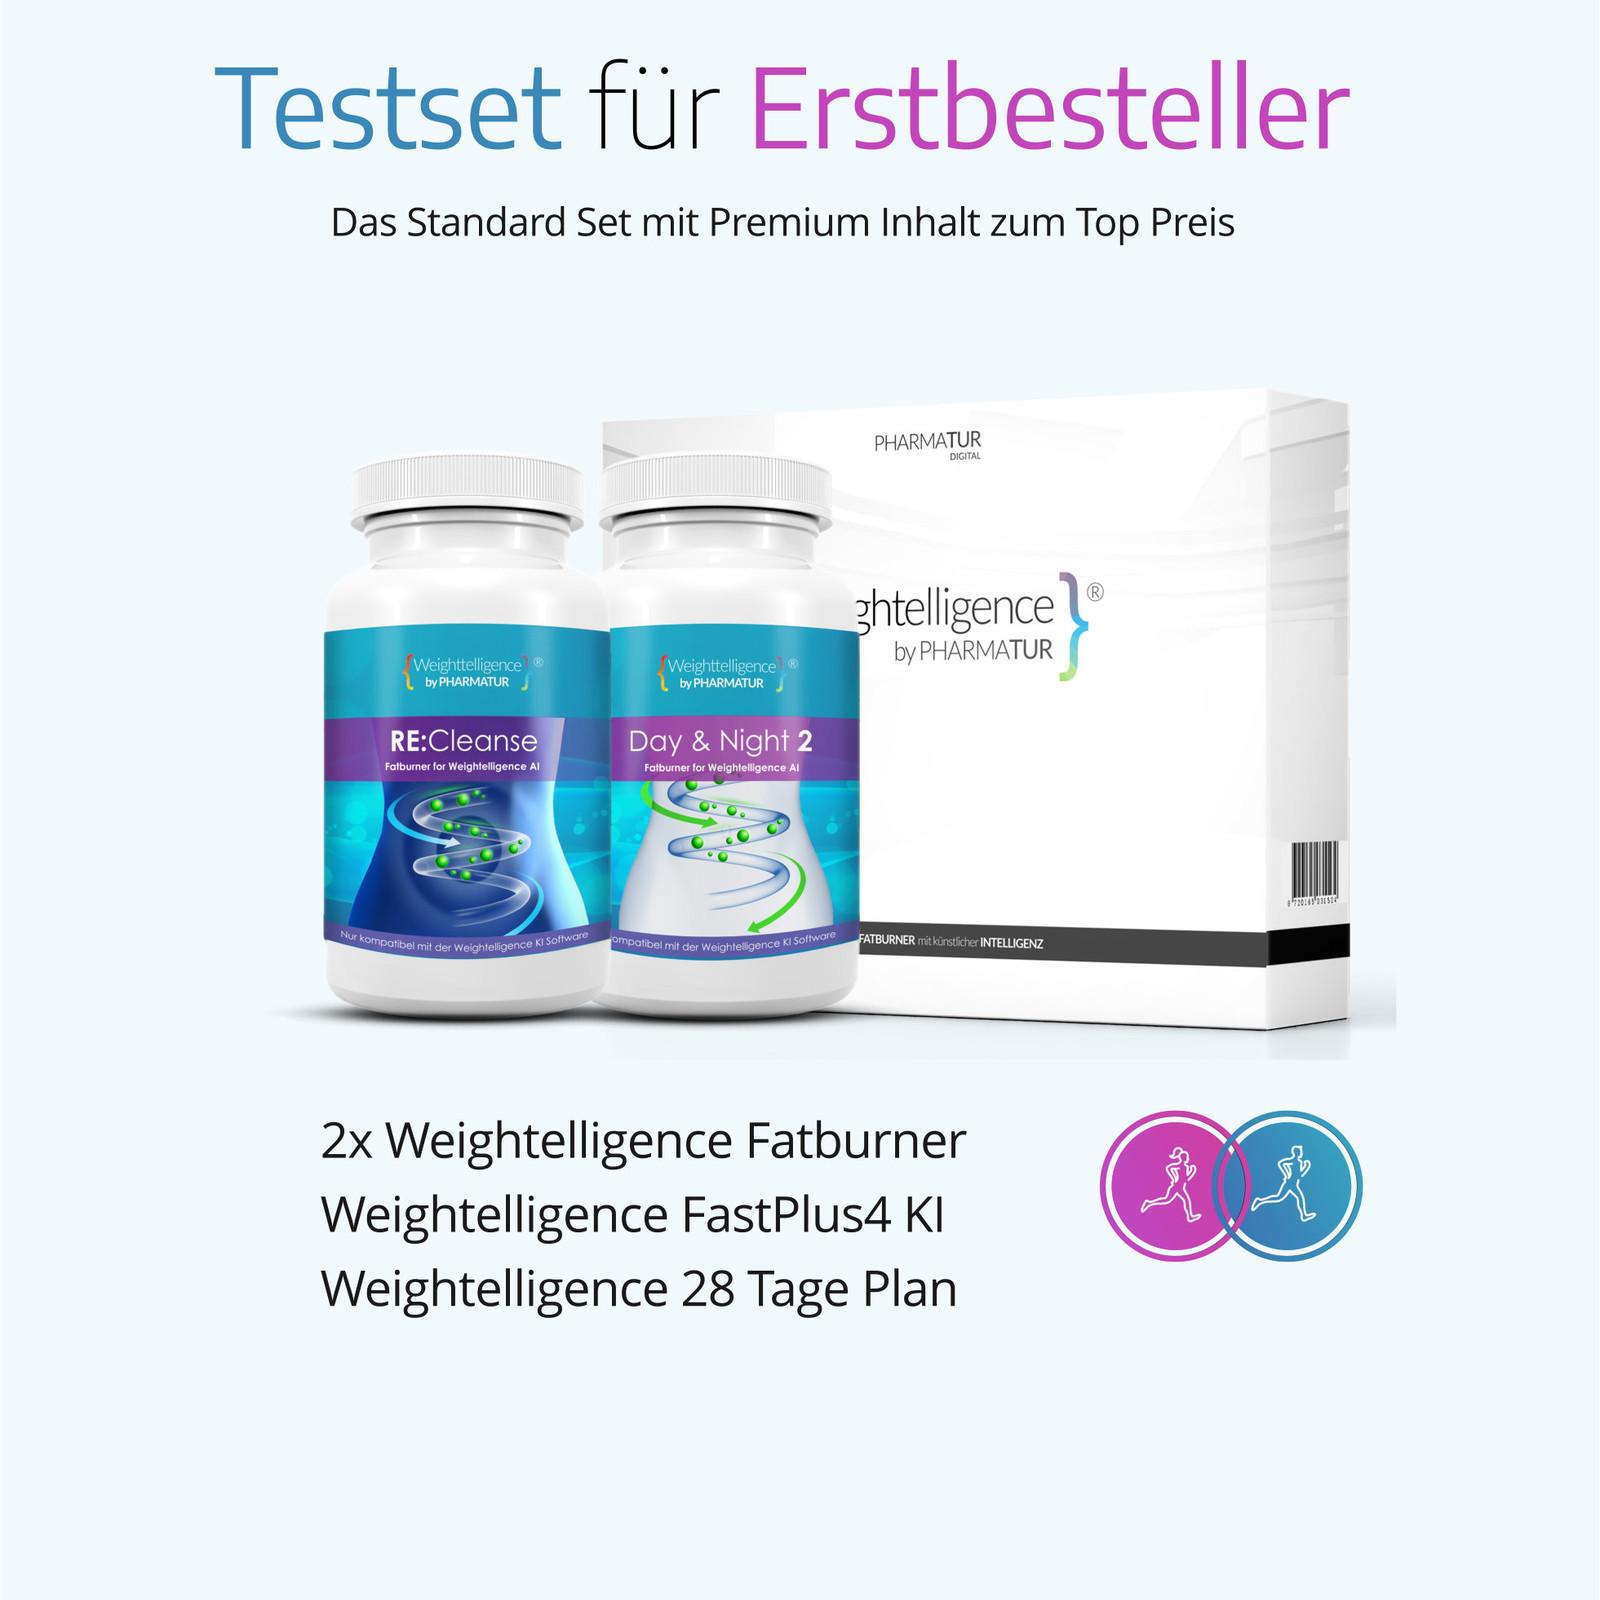 Weightelligence Weightelligence® Start 1 Monat (Inklusive Day&Night + Re:Cleanse & Fatburn KI)